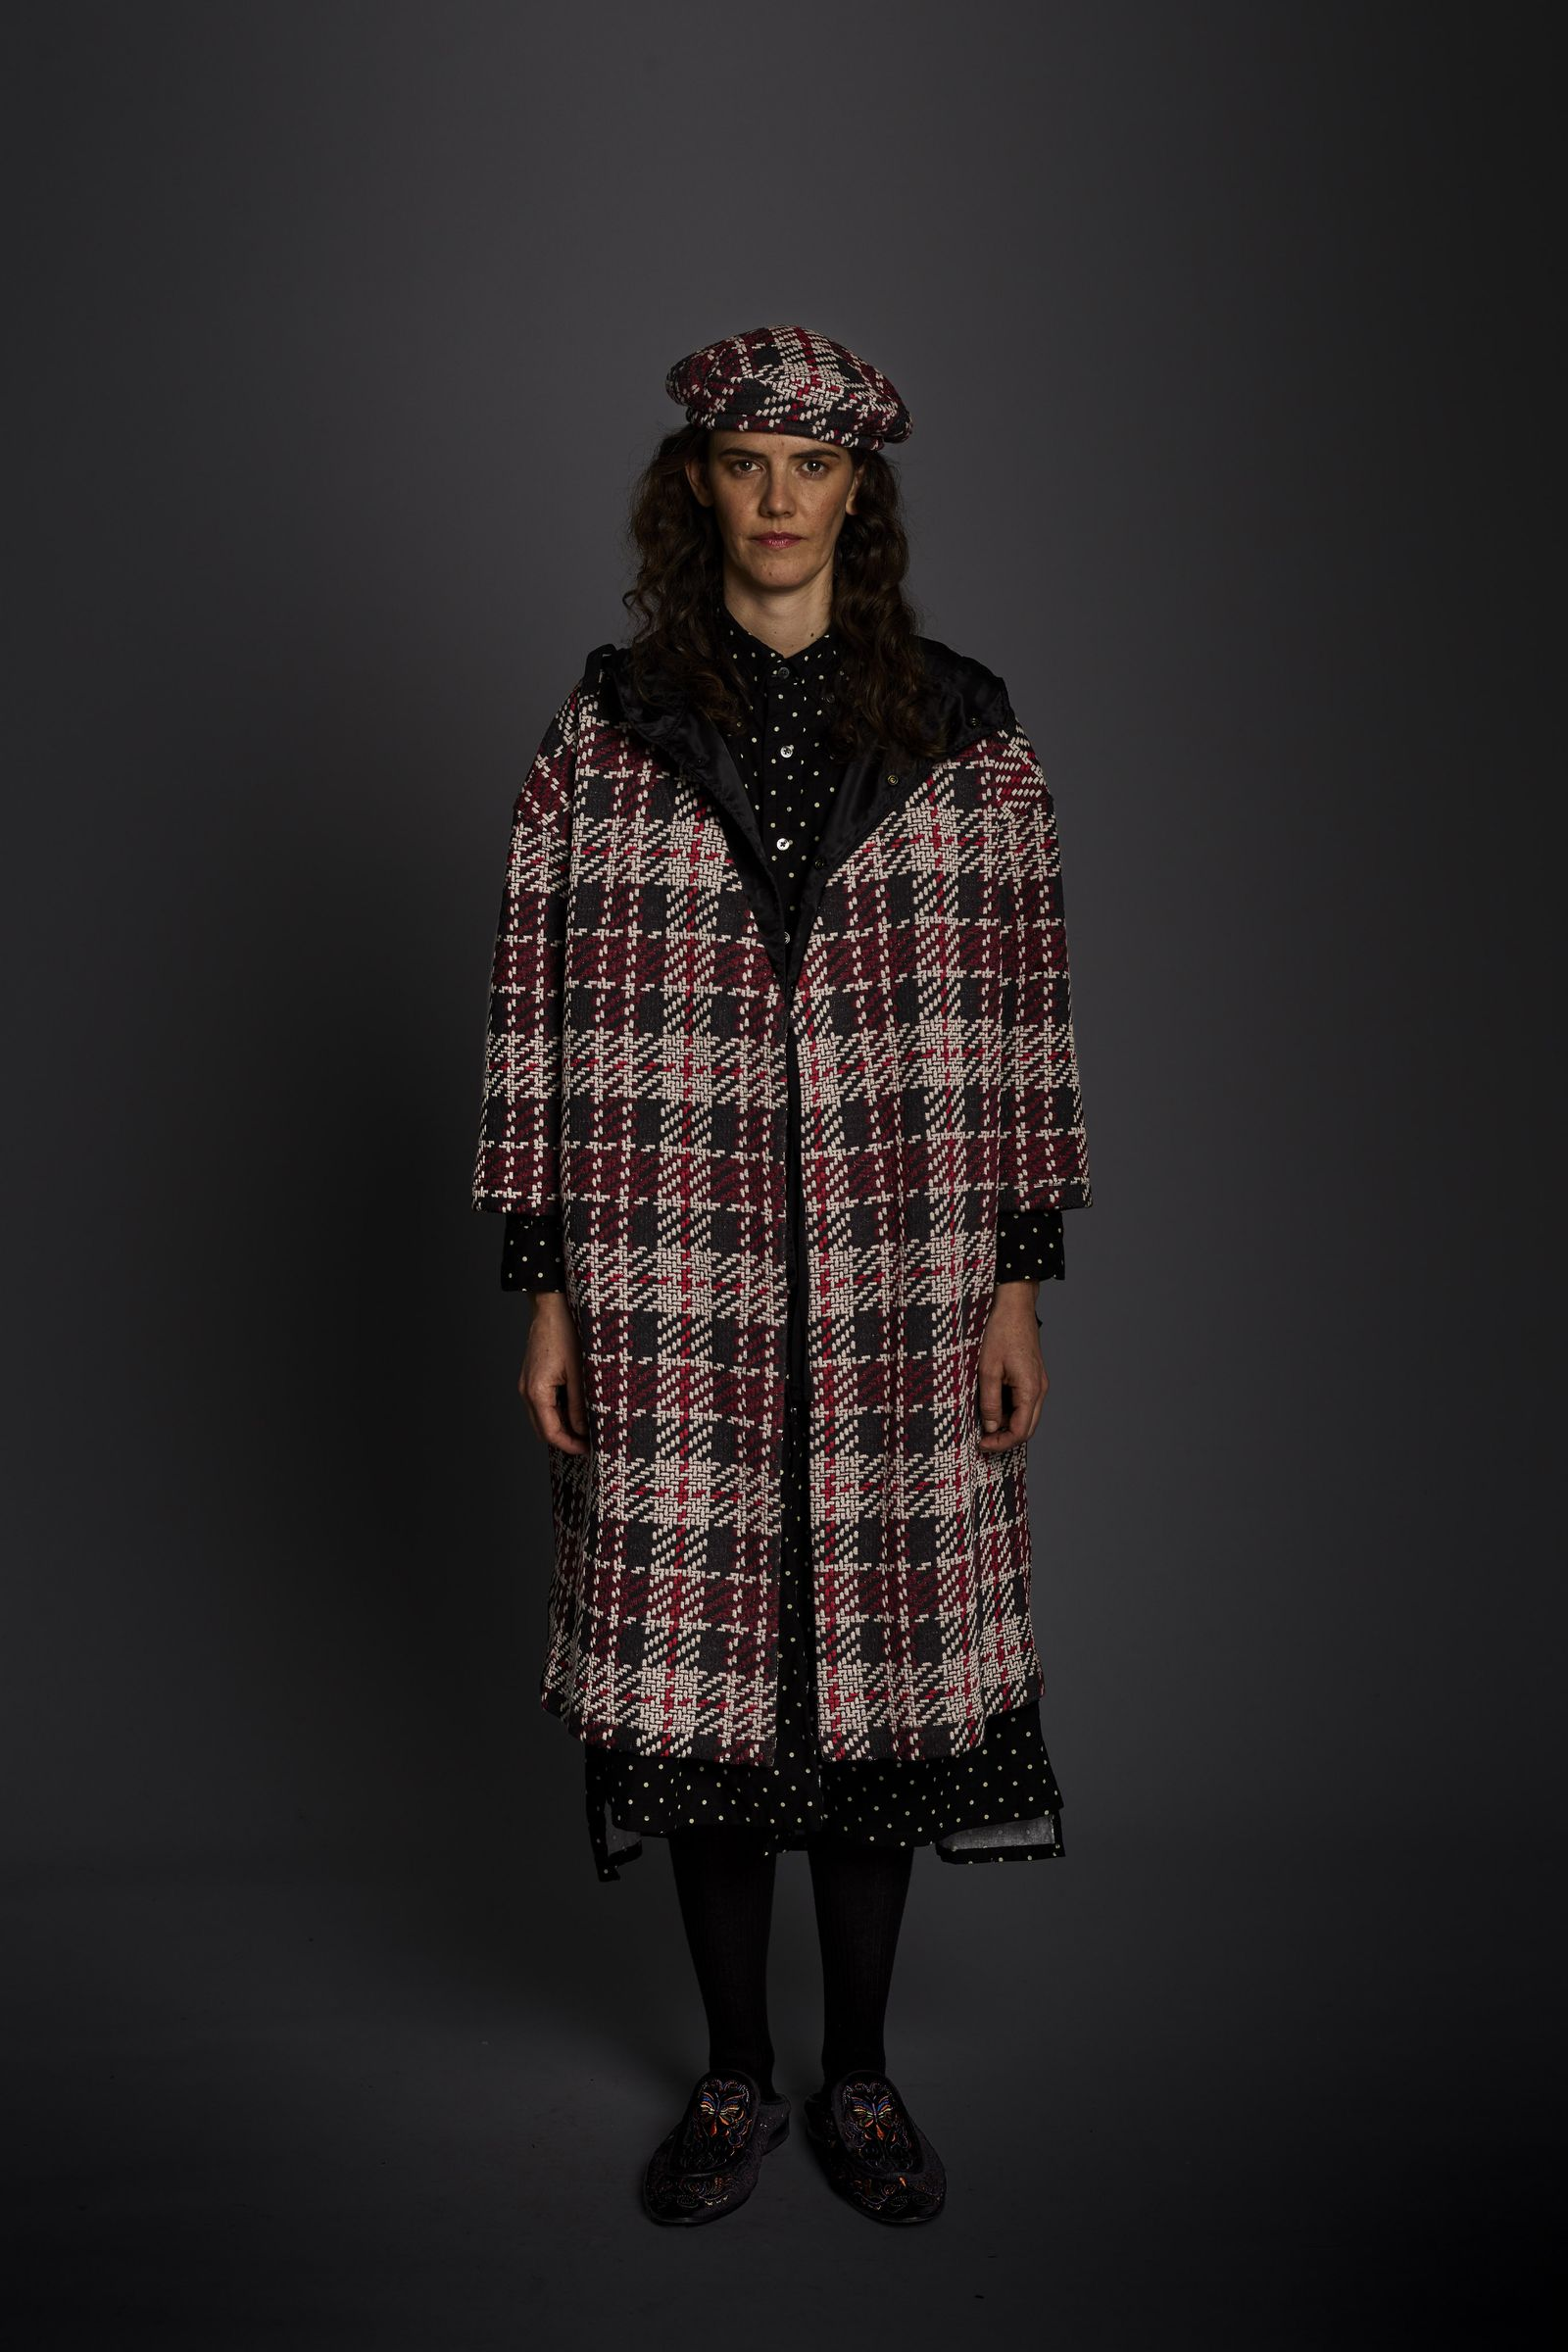 engineered-garments-fall-winter-2020-09